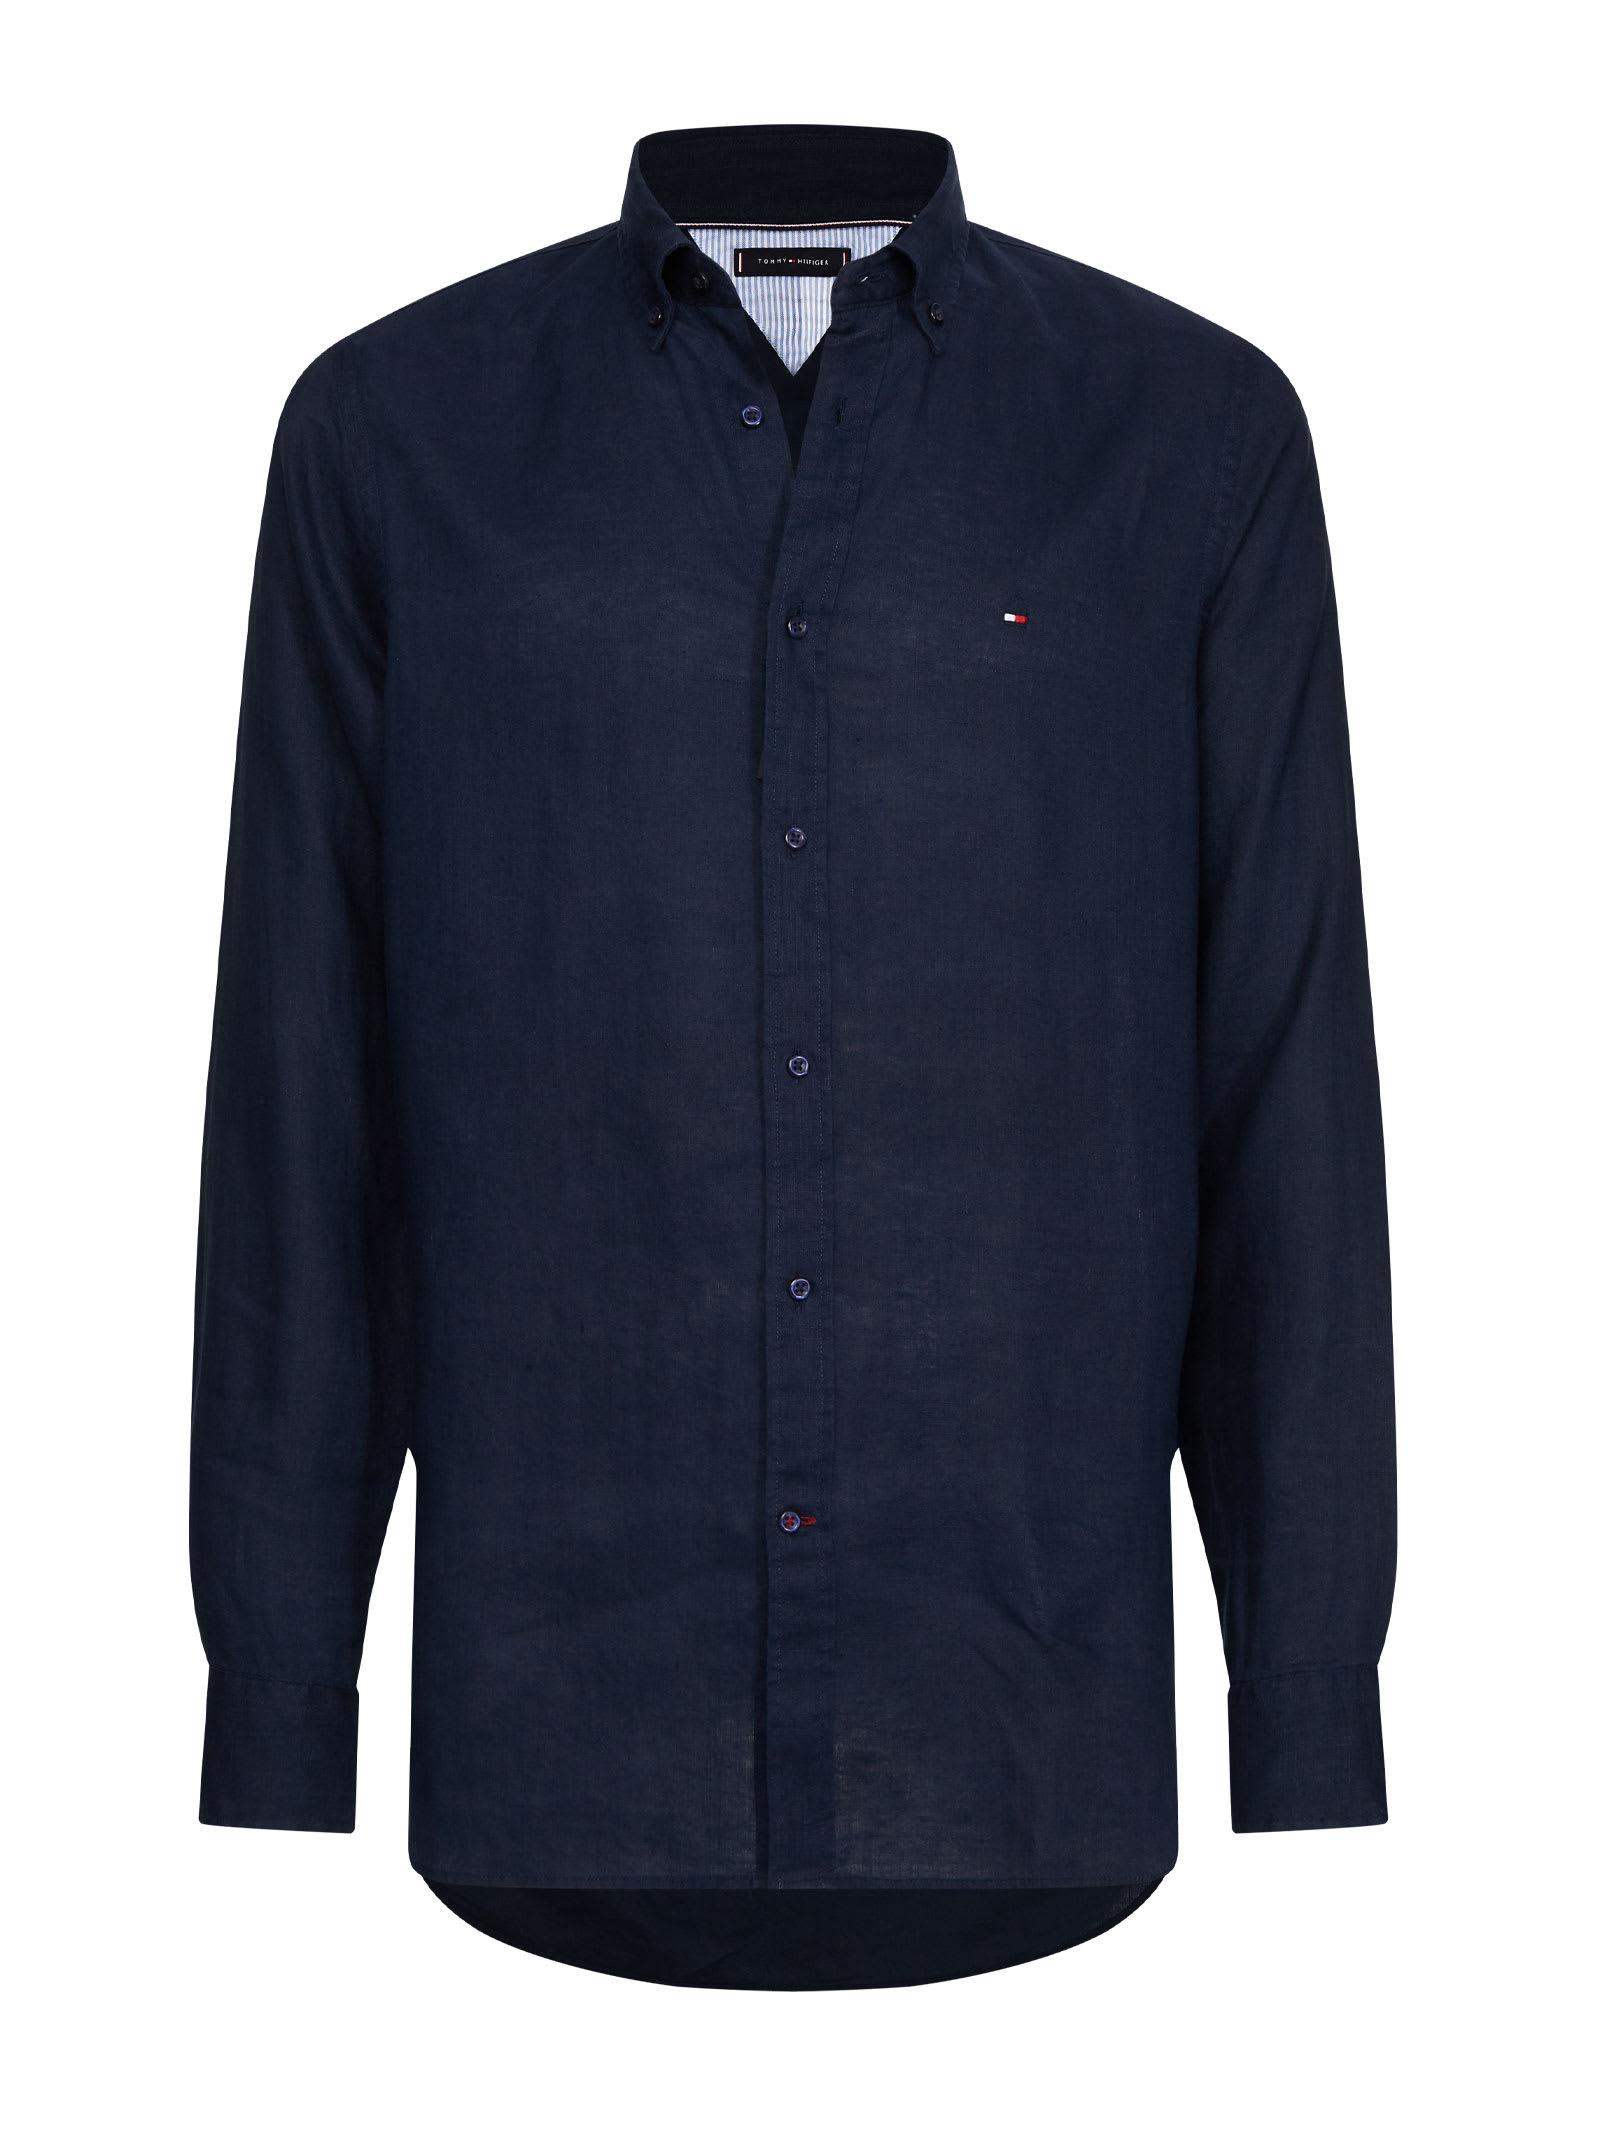 Tommy Hilfiger Tommy Hilfiger Button Down Linen Shirt